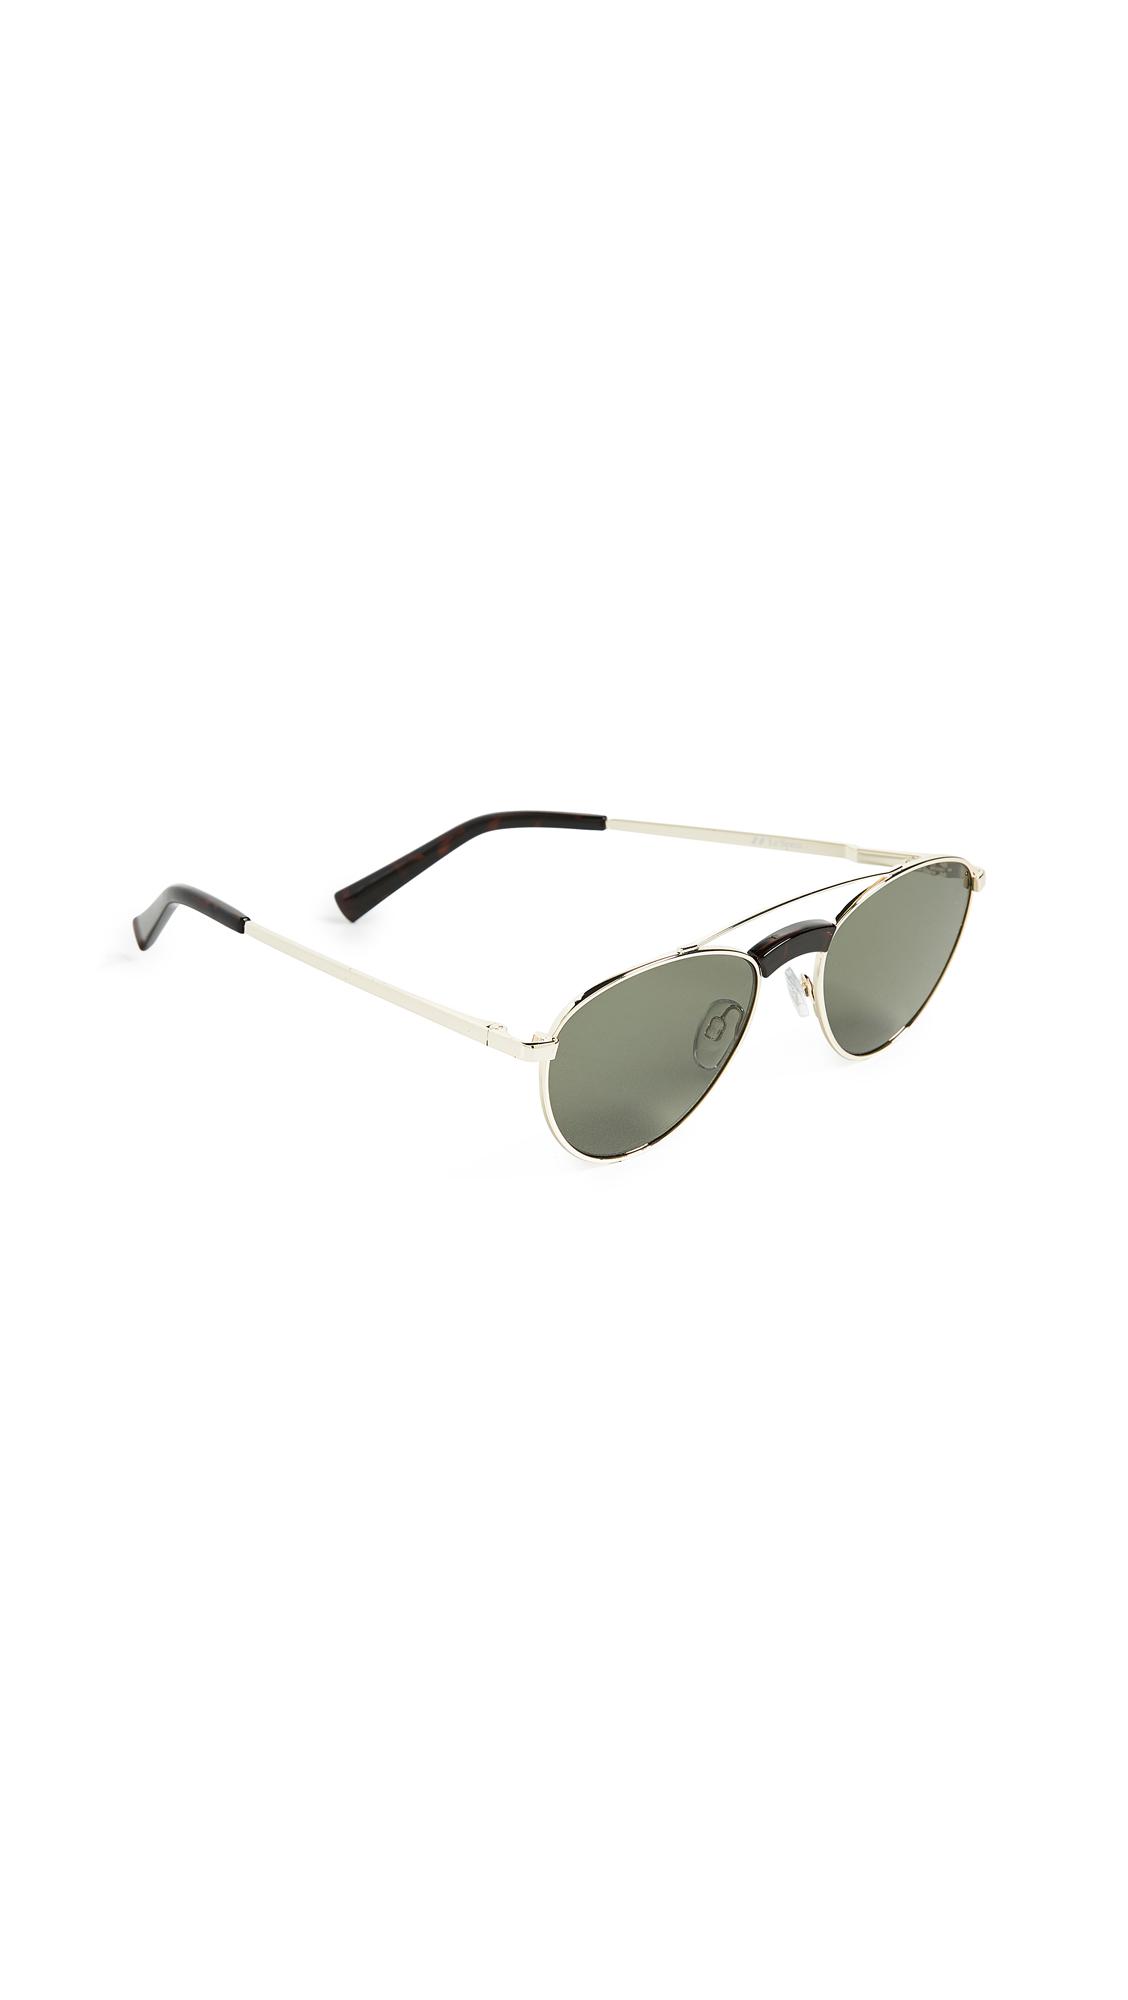 Rocket Man Edition aviator sunglasses